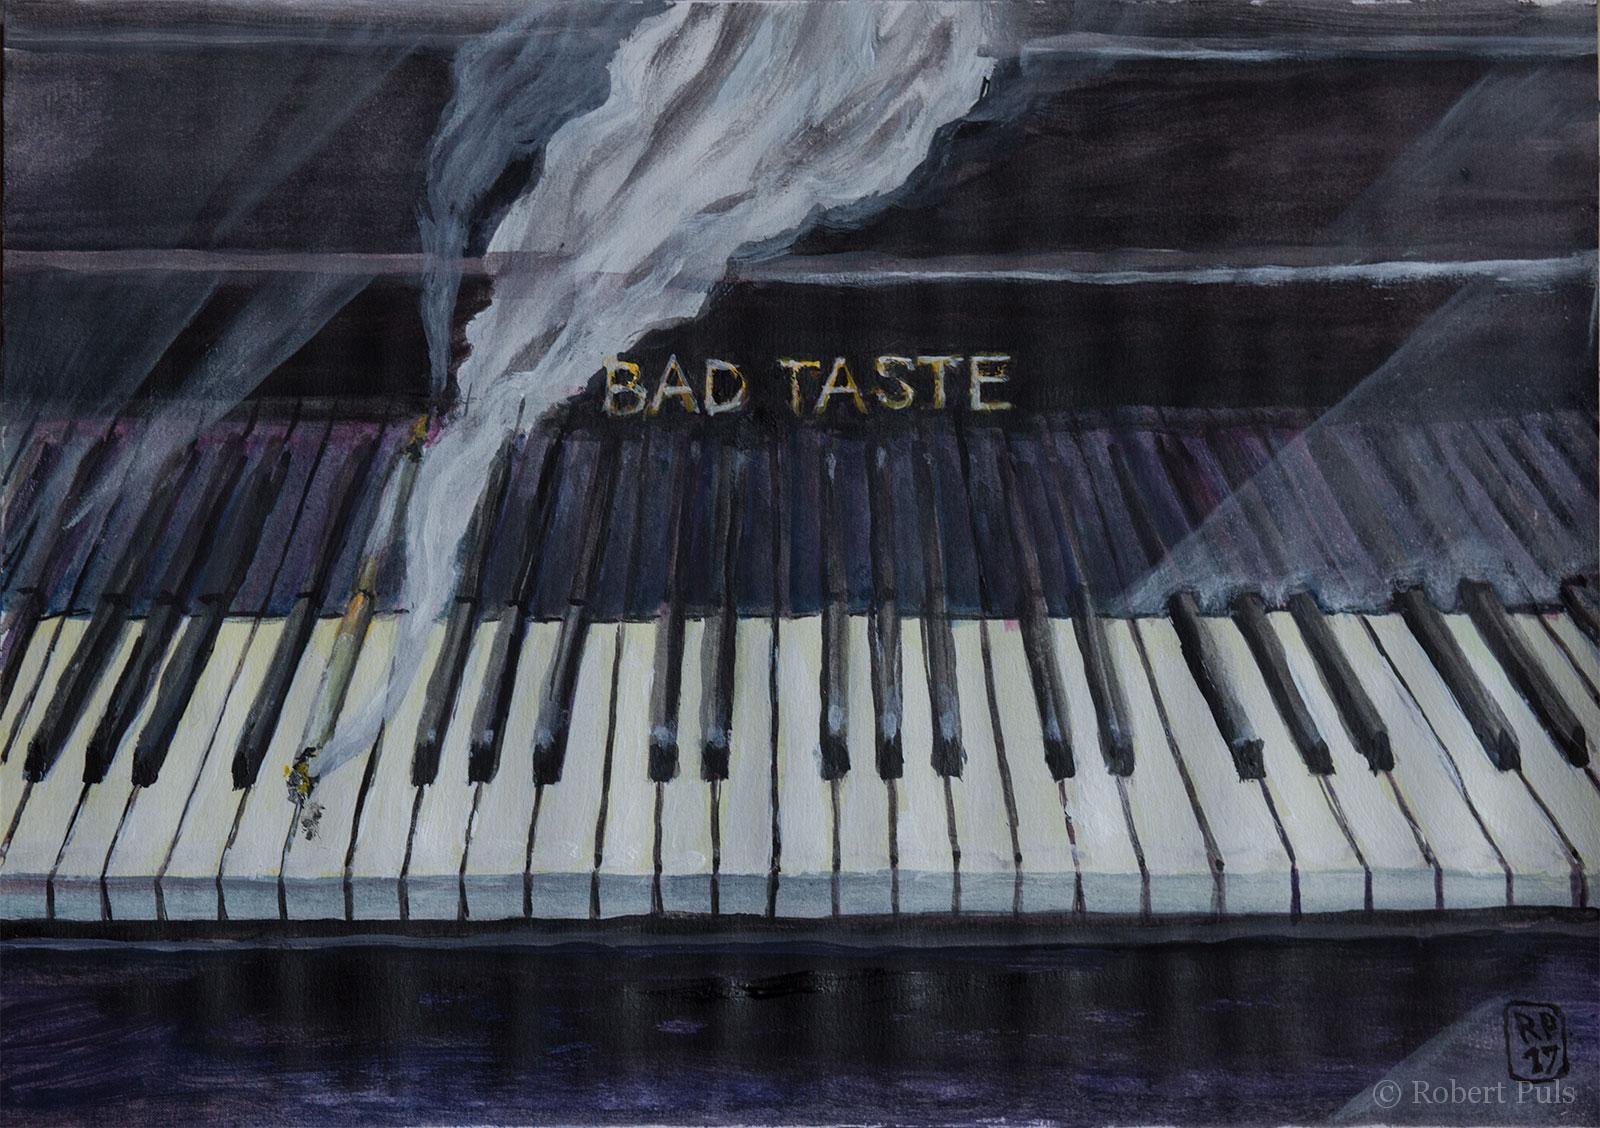 Bad Taste Zigarette Klavier